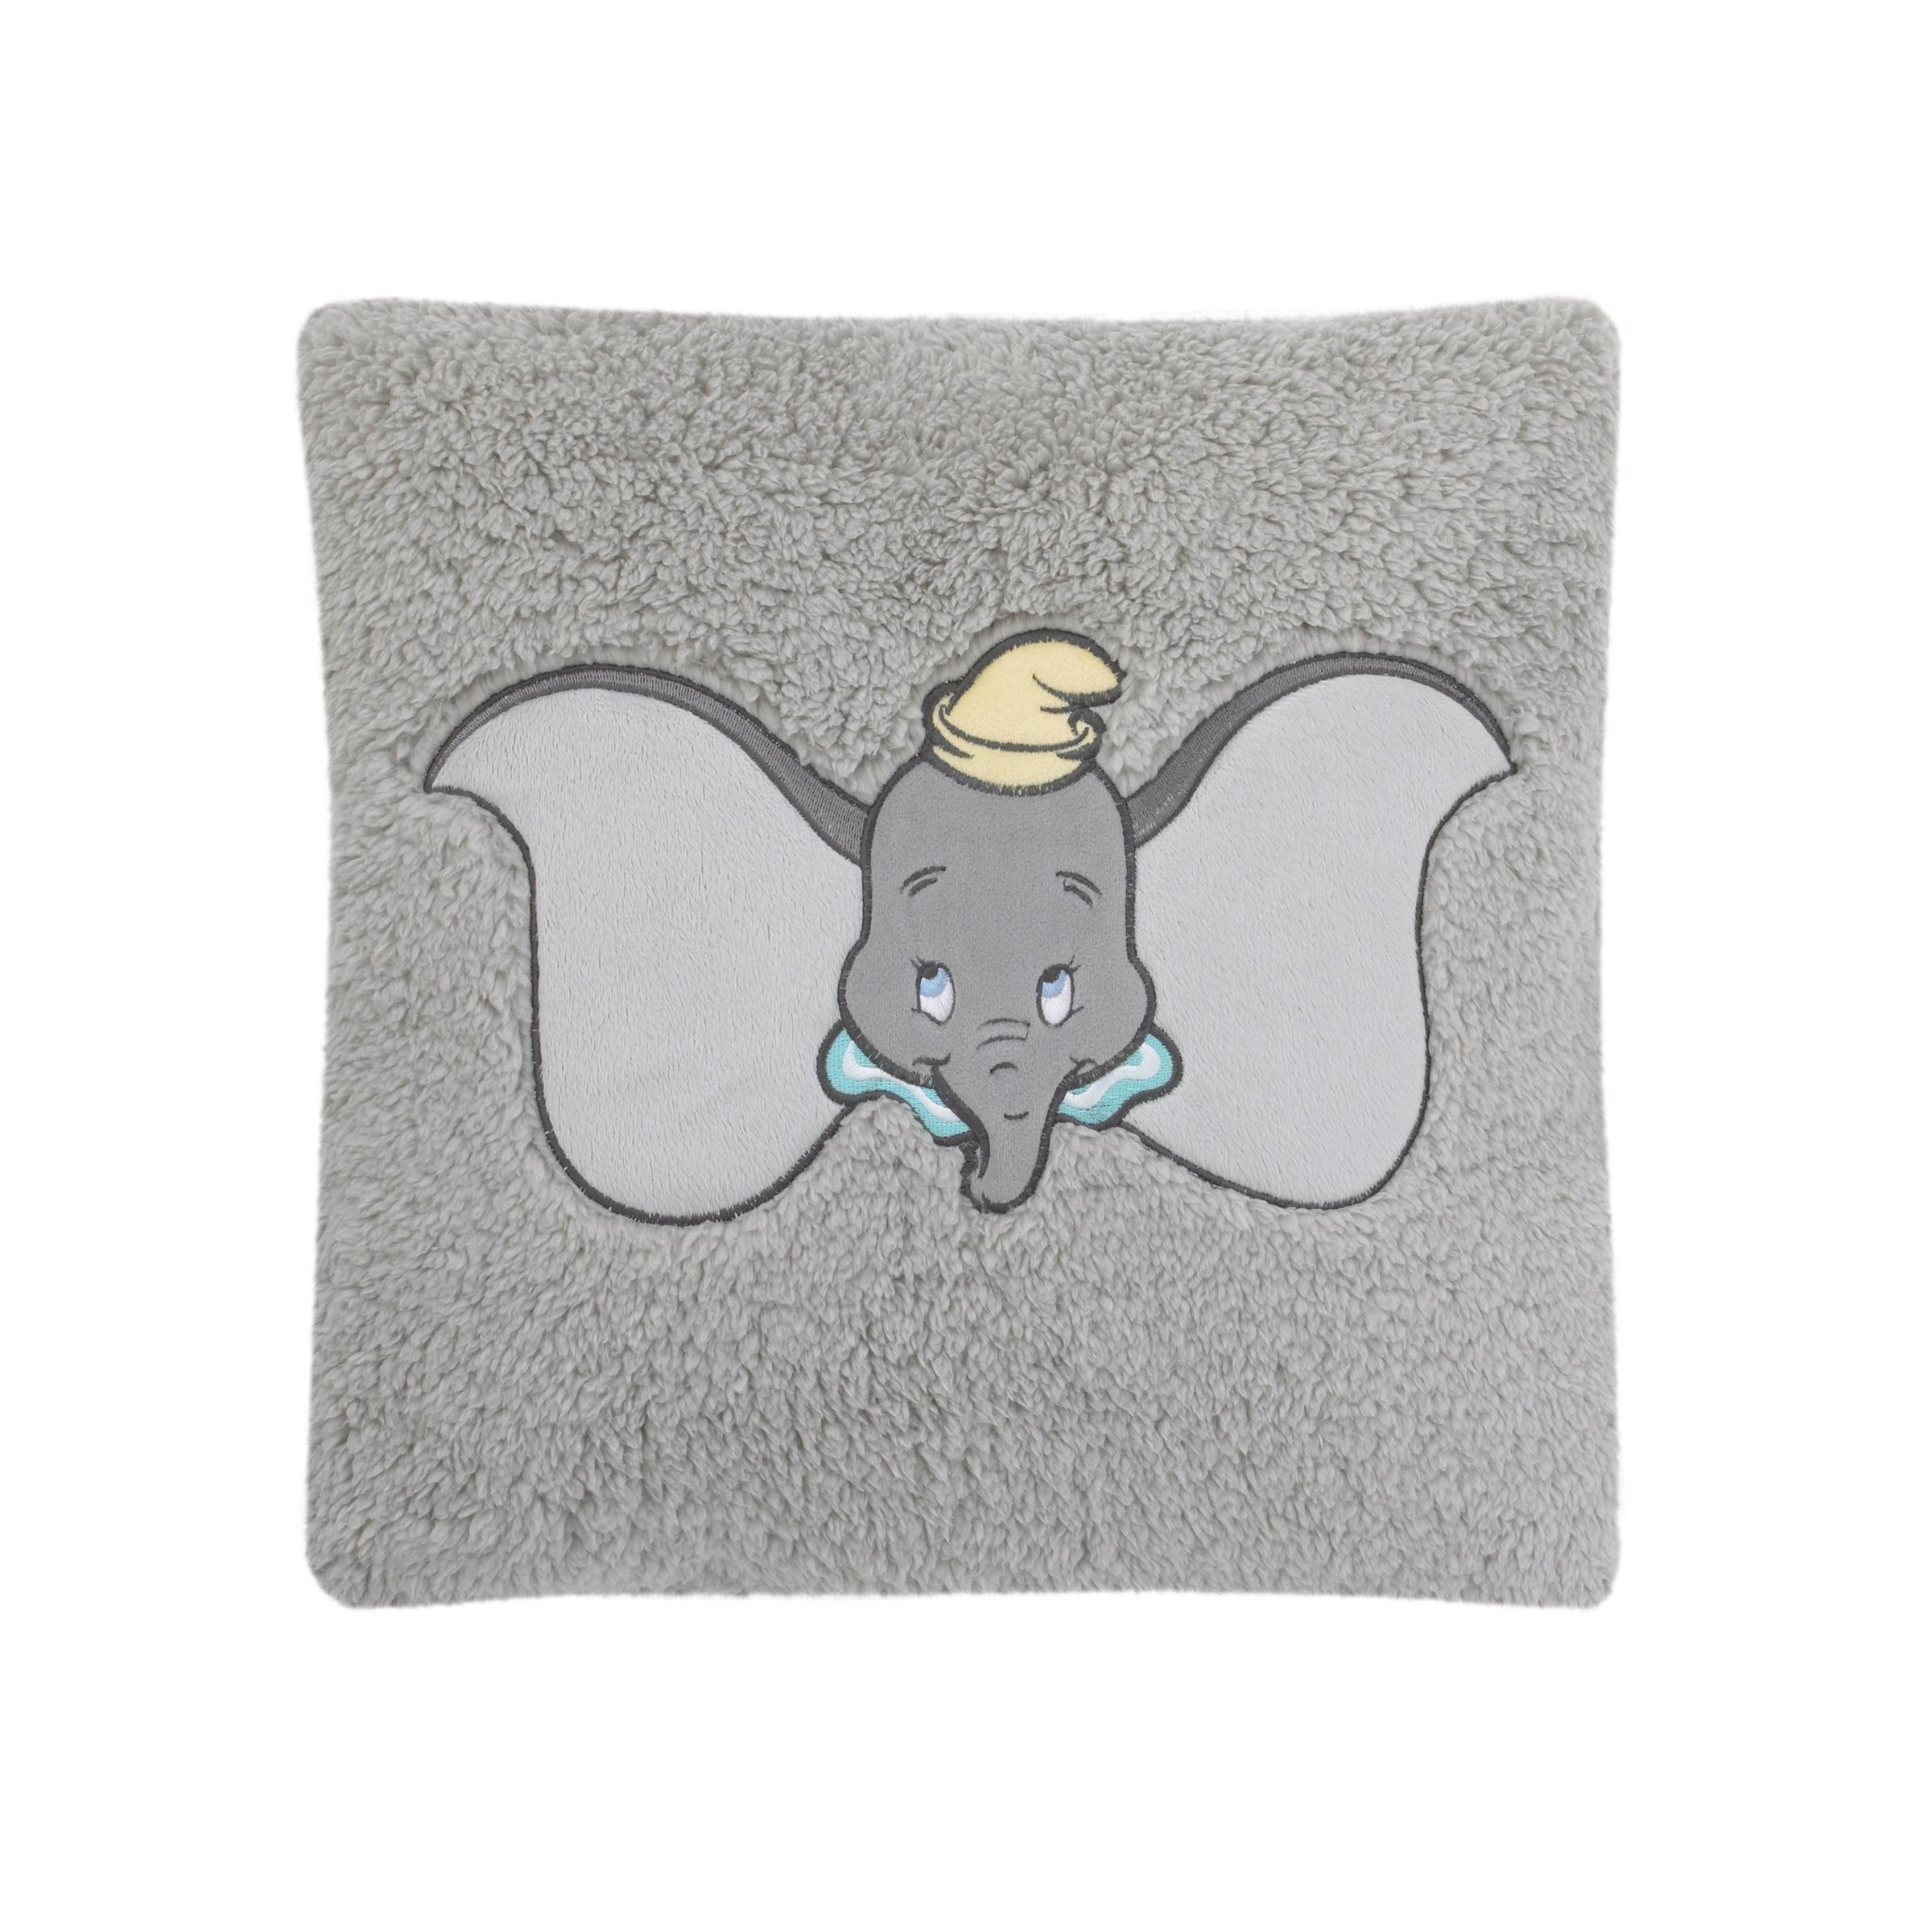 Disney Dumbo Grey, Aqua, and Yellow Plush Appliqued Decorative Sherpa Pillow